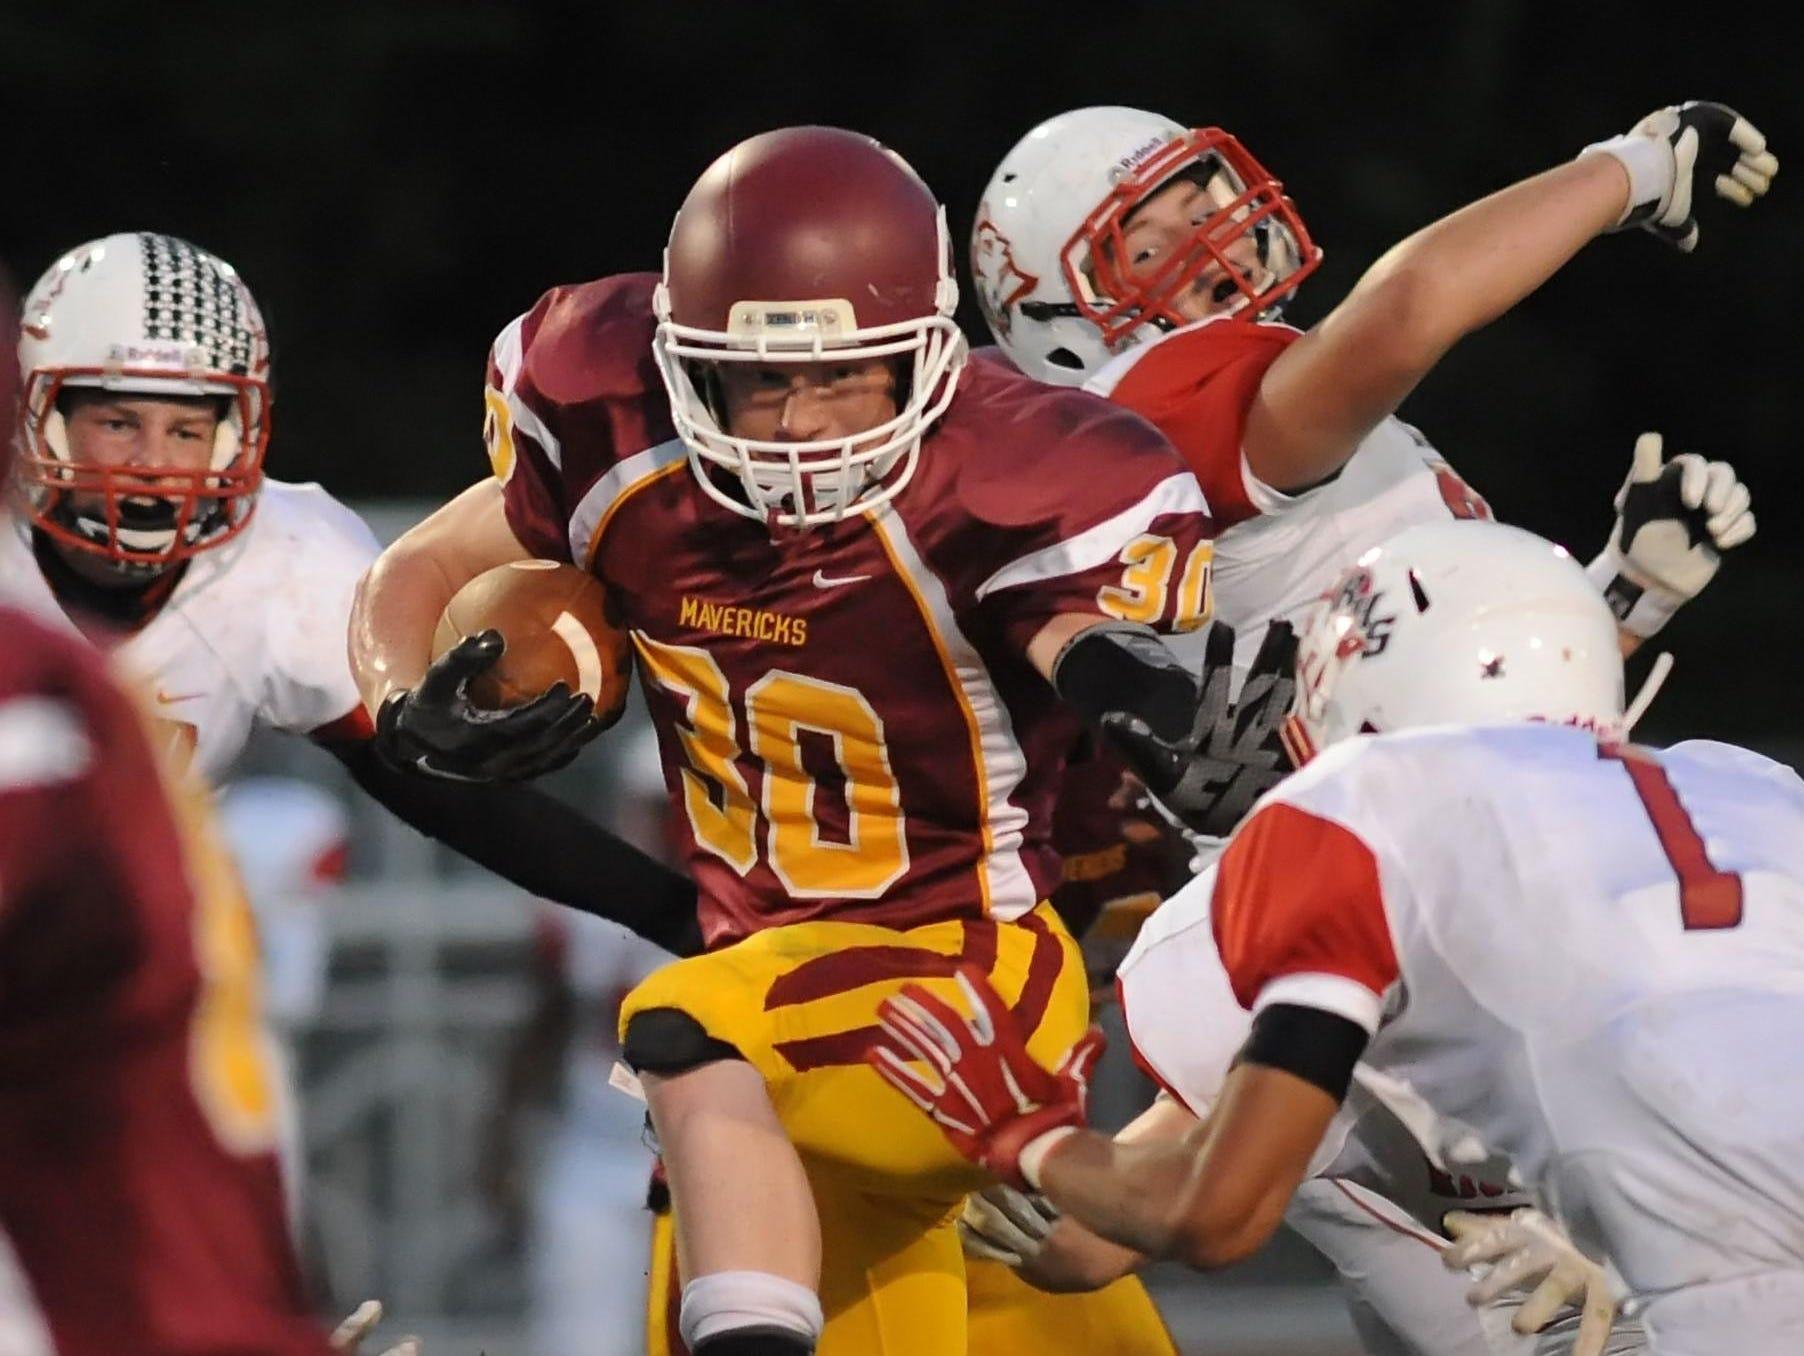 McCutcheon senior wide receiver Dakota Loveless drives downfield though Richmond defenders Friday night.